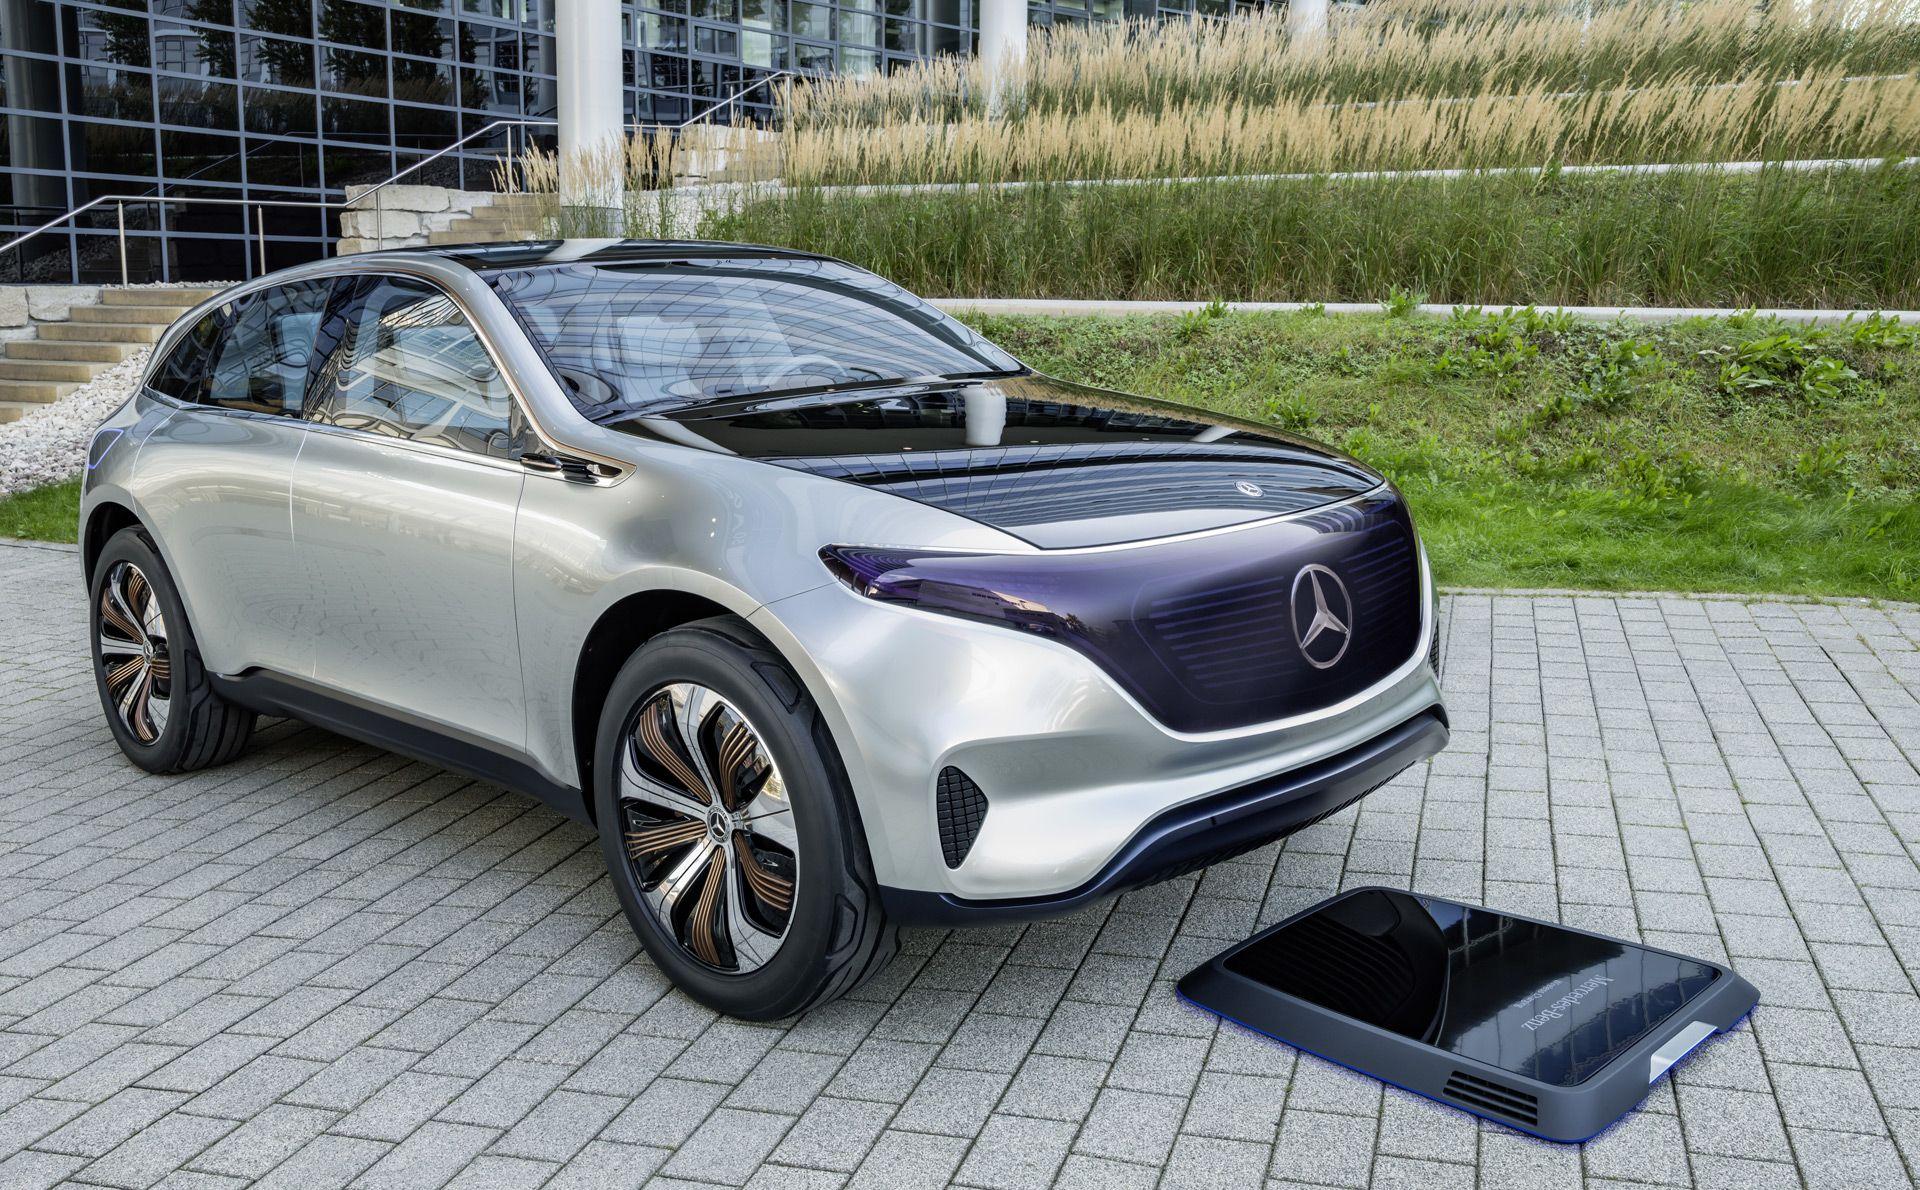 Audi E Tron Vs Jaguar I Pace Vs Mercedes Eq Electric Luxury Suvs Compared Mercedes Benz Australia Electric Cars Electric Car Concept